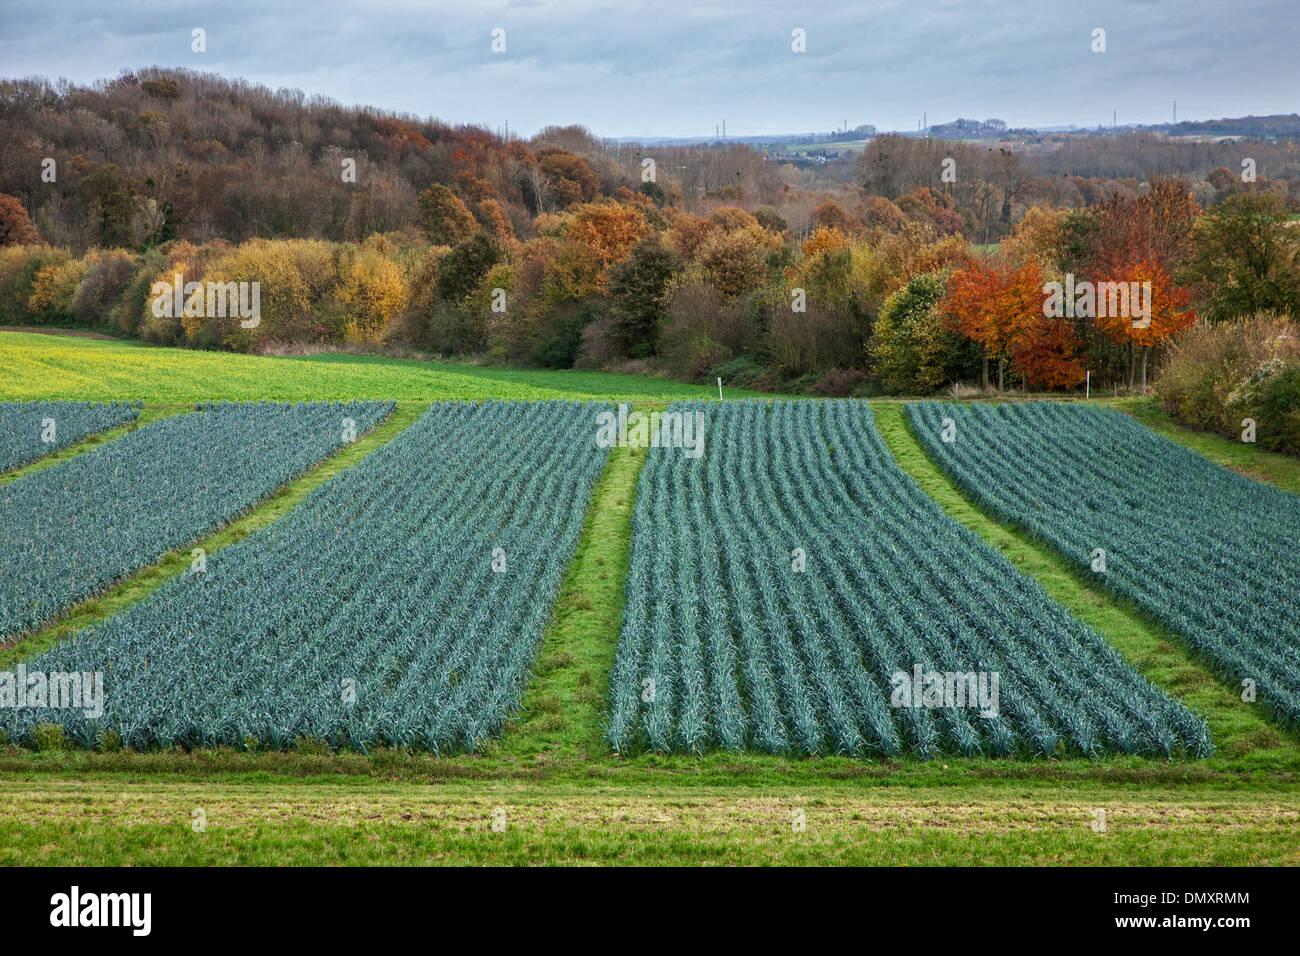 Rural landscape showing field with leek beds (Allium ampeloprasum) - Stock Image